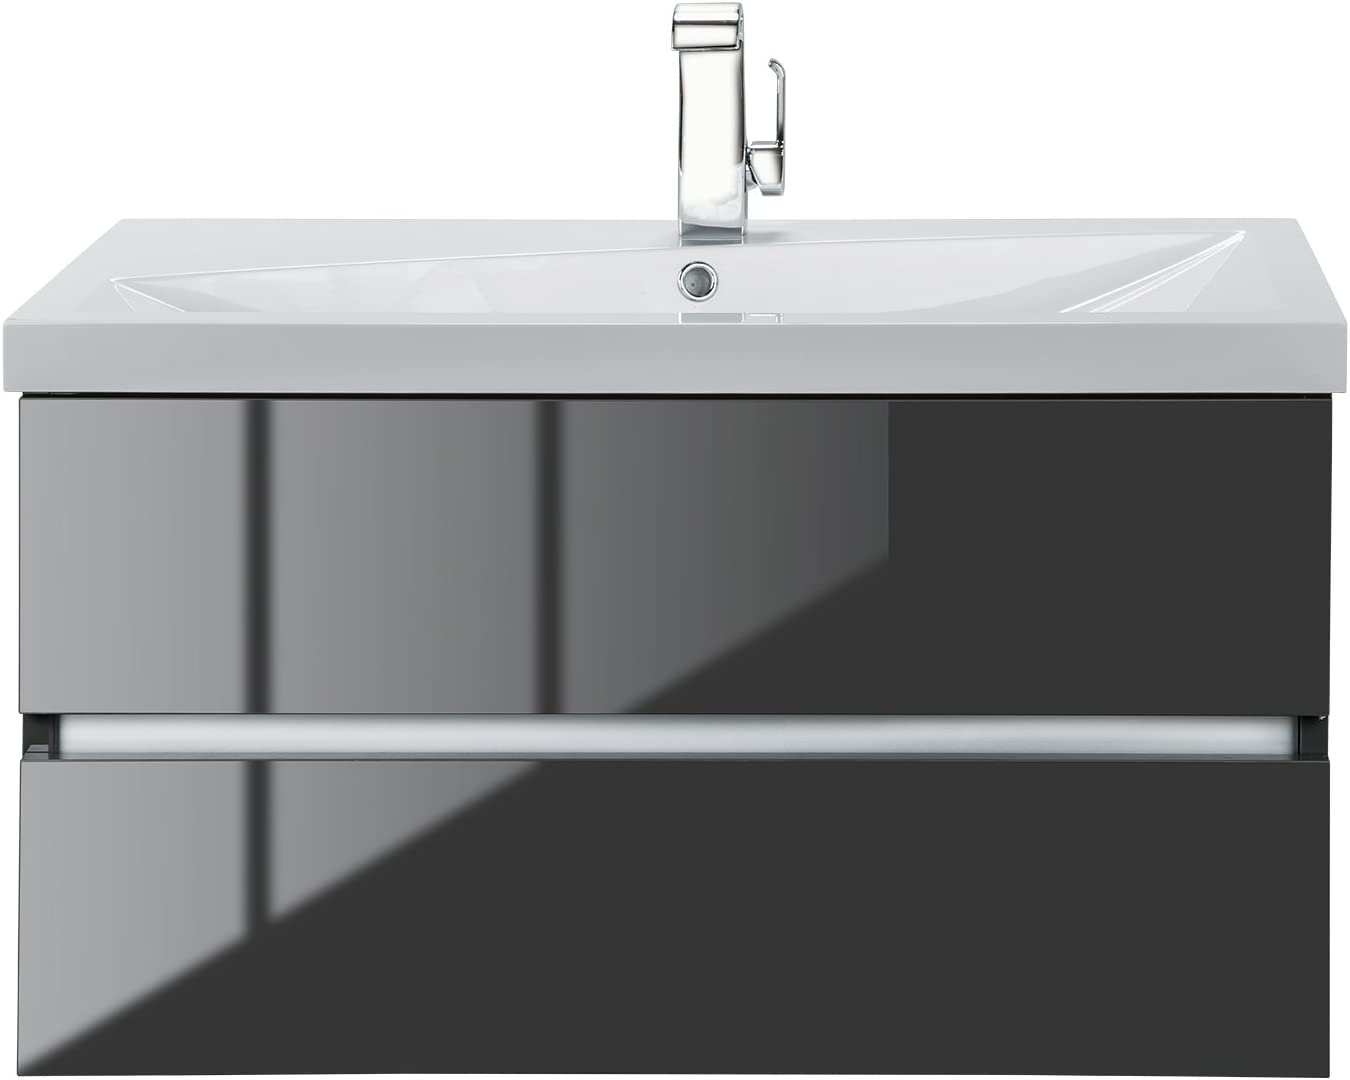 Cutler Kitchen Bath Fvlava36 Cutler Kitchen And Bath Sangallo Wall Hung Gloss Bathroom Vanity Lava Grey 36 Inches Amazon Com